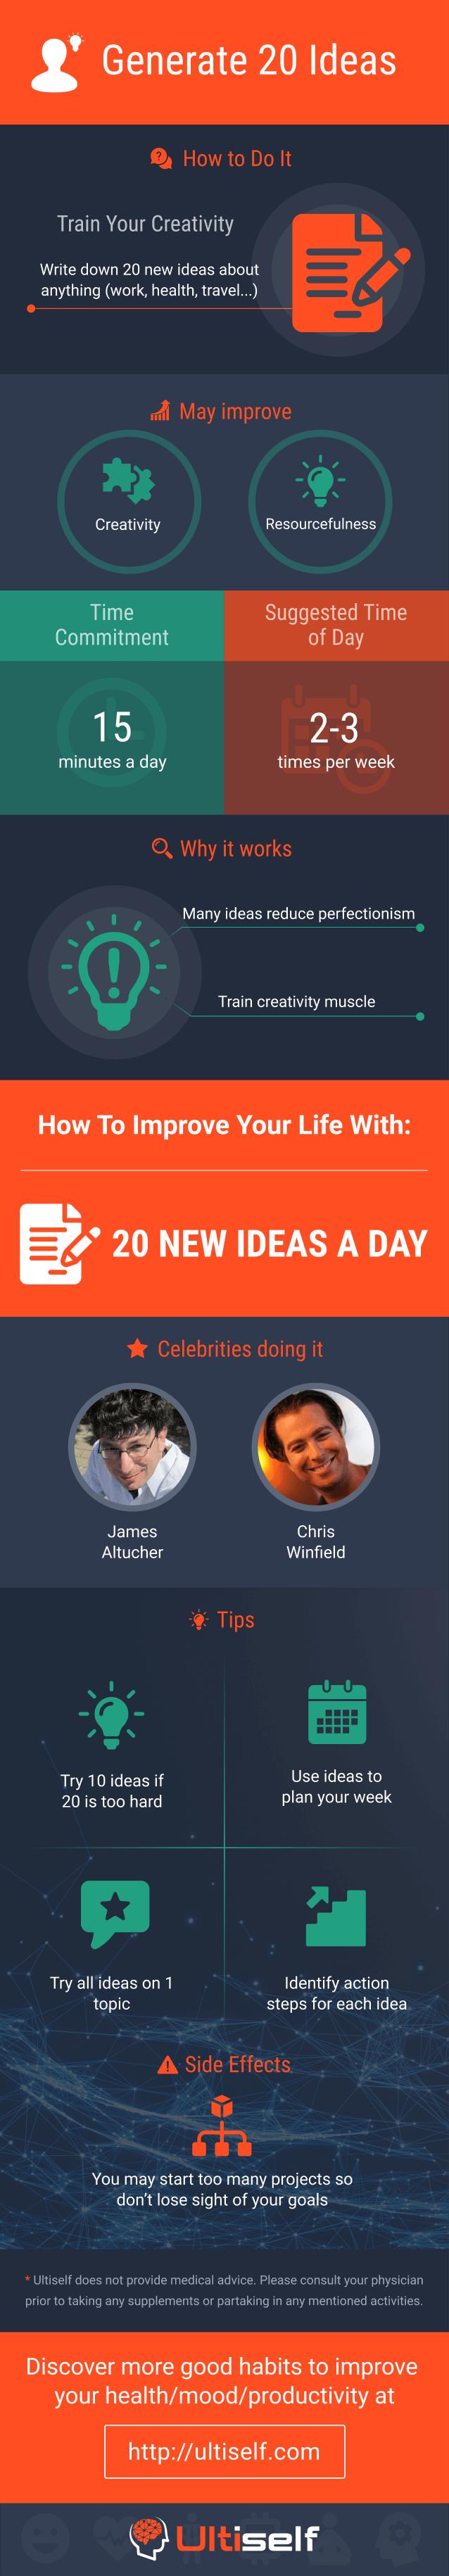 Generate 20 ideas infographic